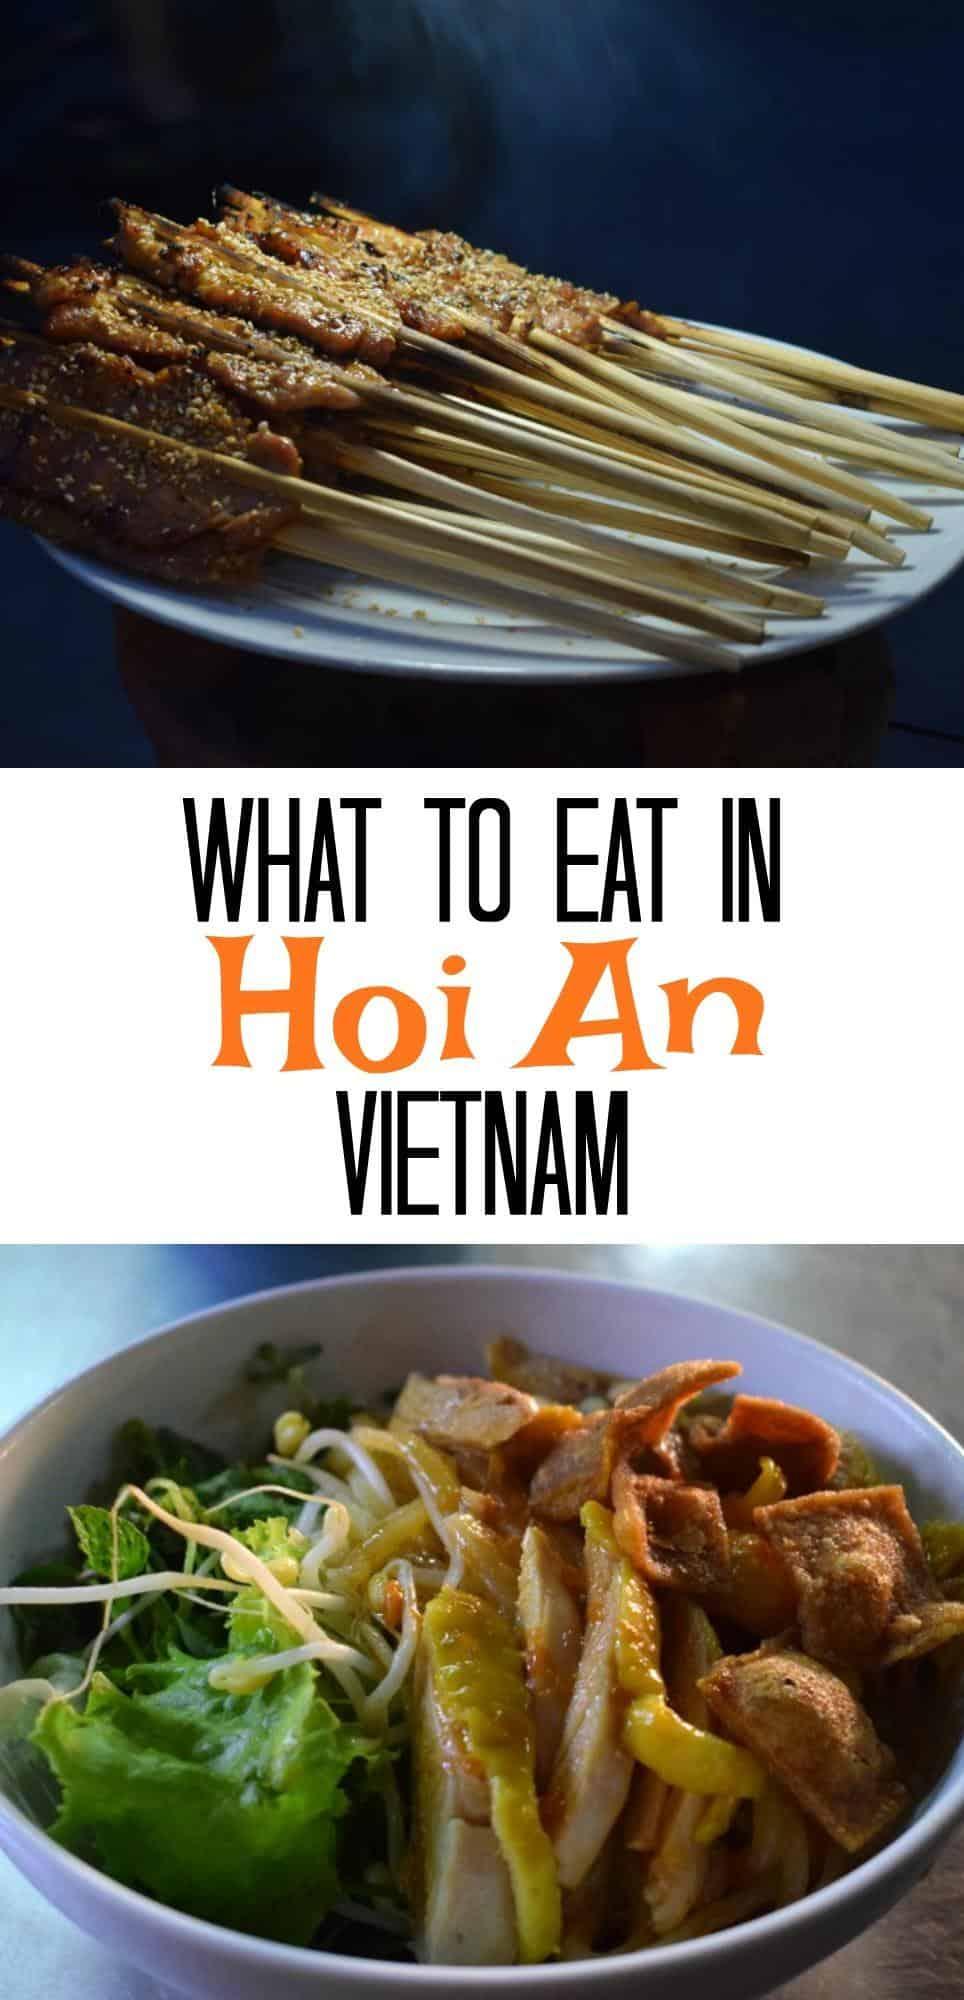 What to Eat in Hoi An Vietnam best food, best restaurants